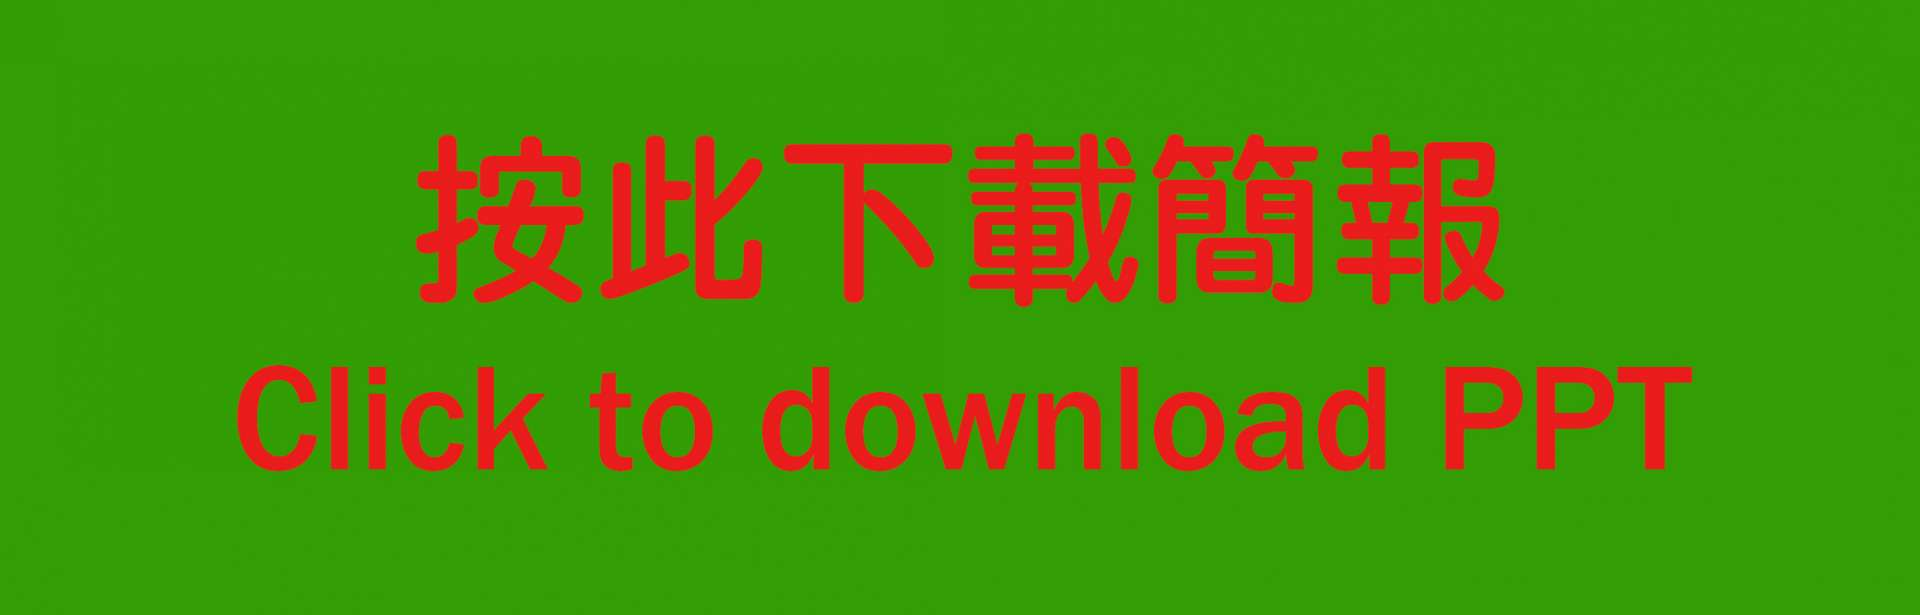 PPT Download